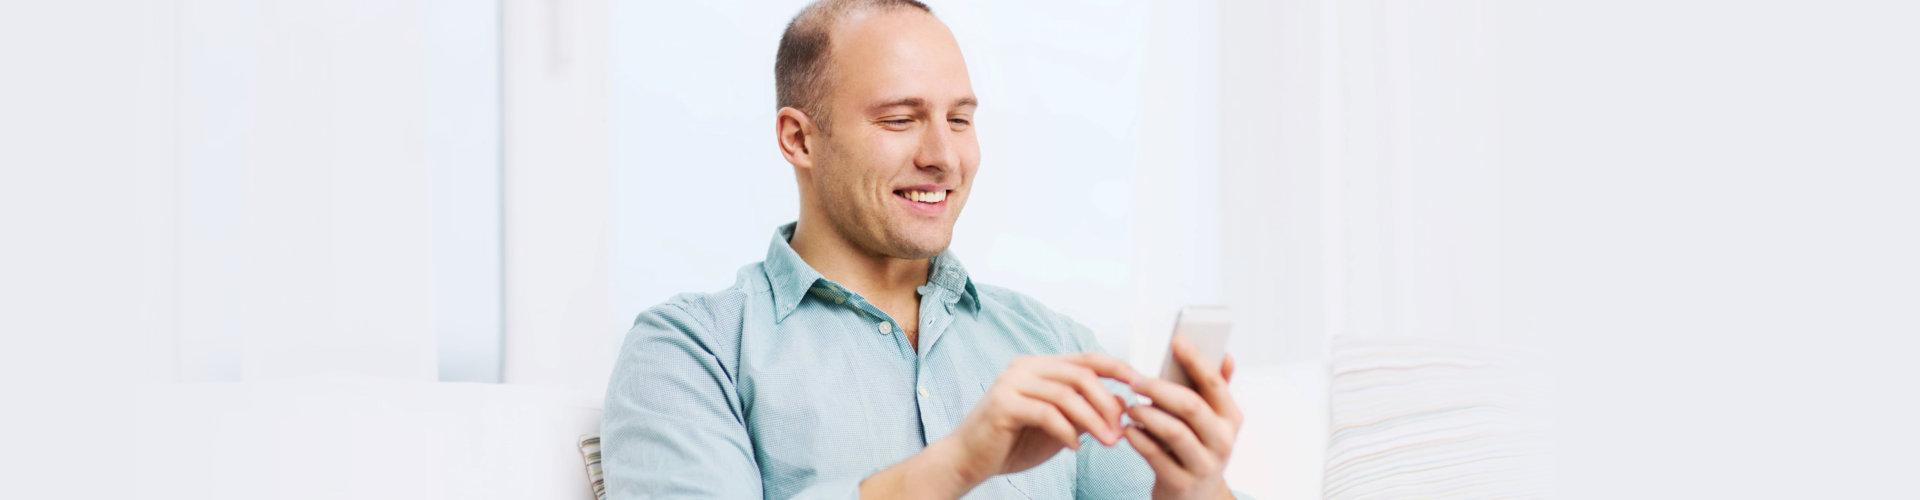 adult man using his phone